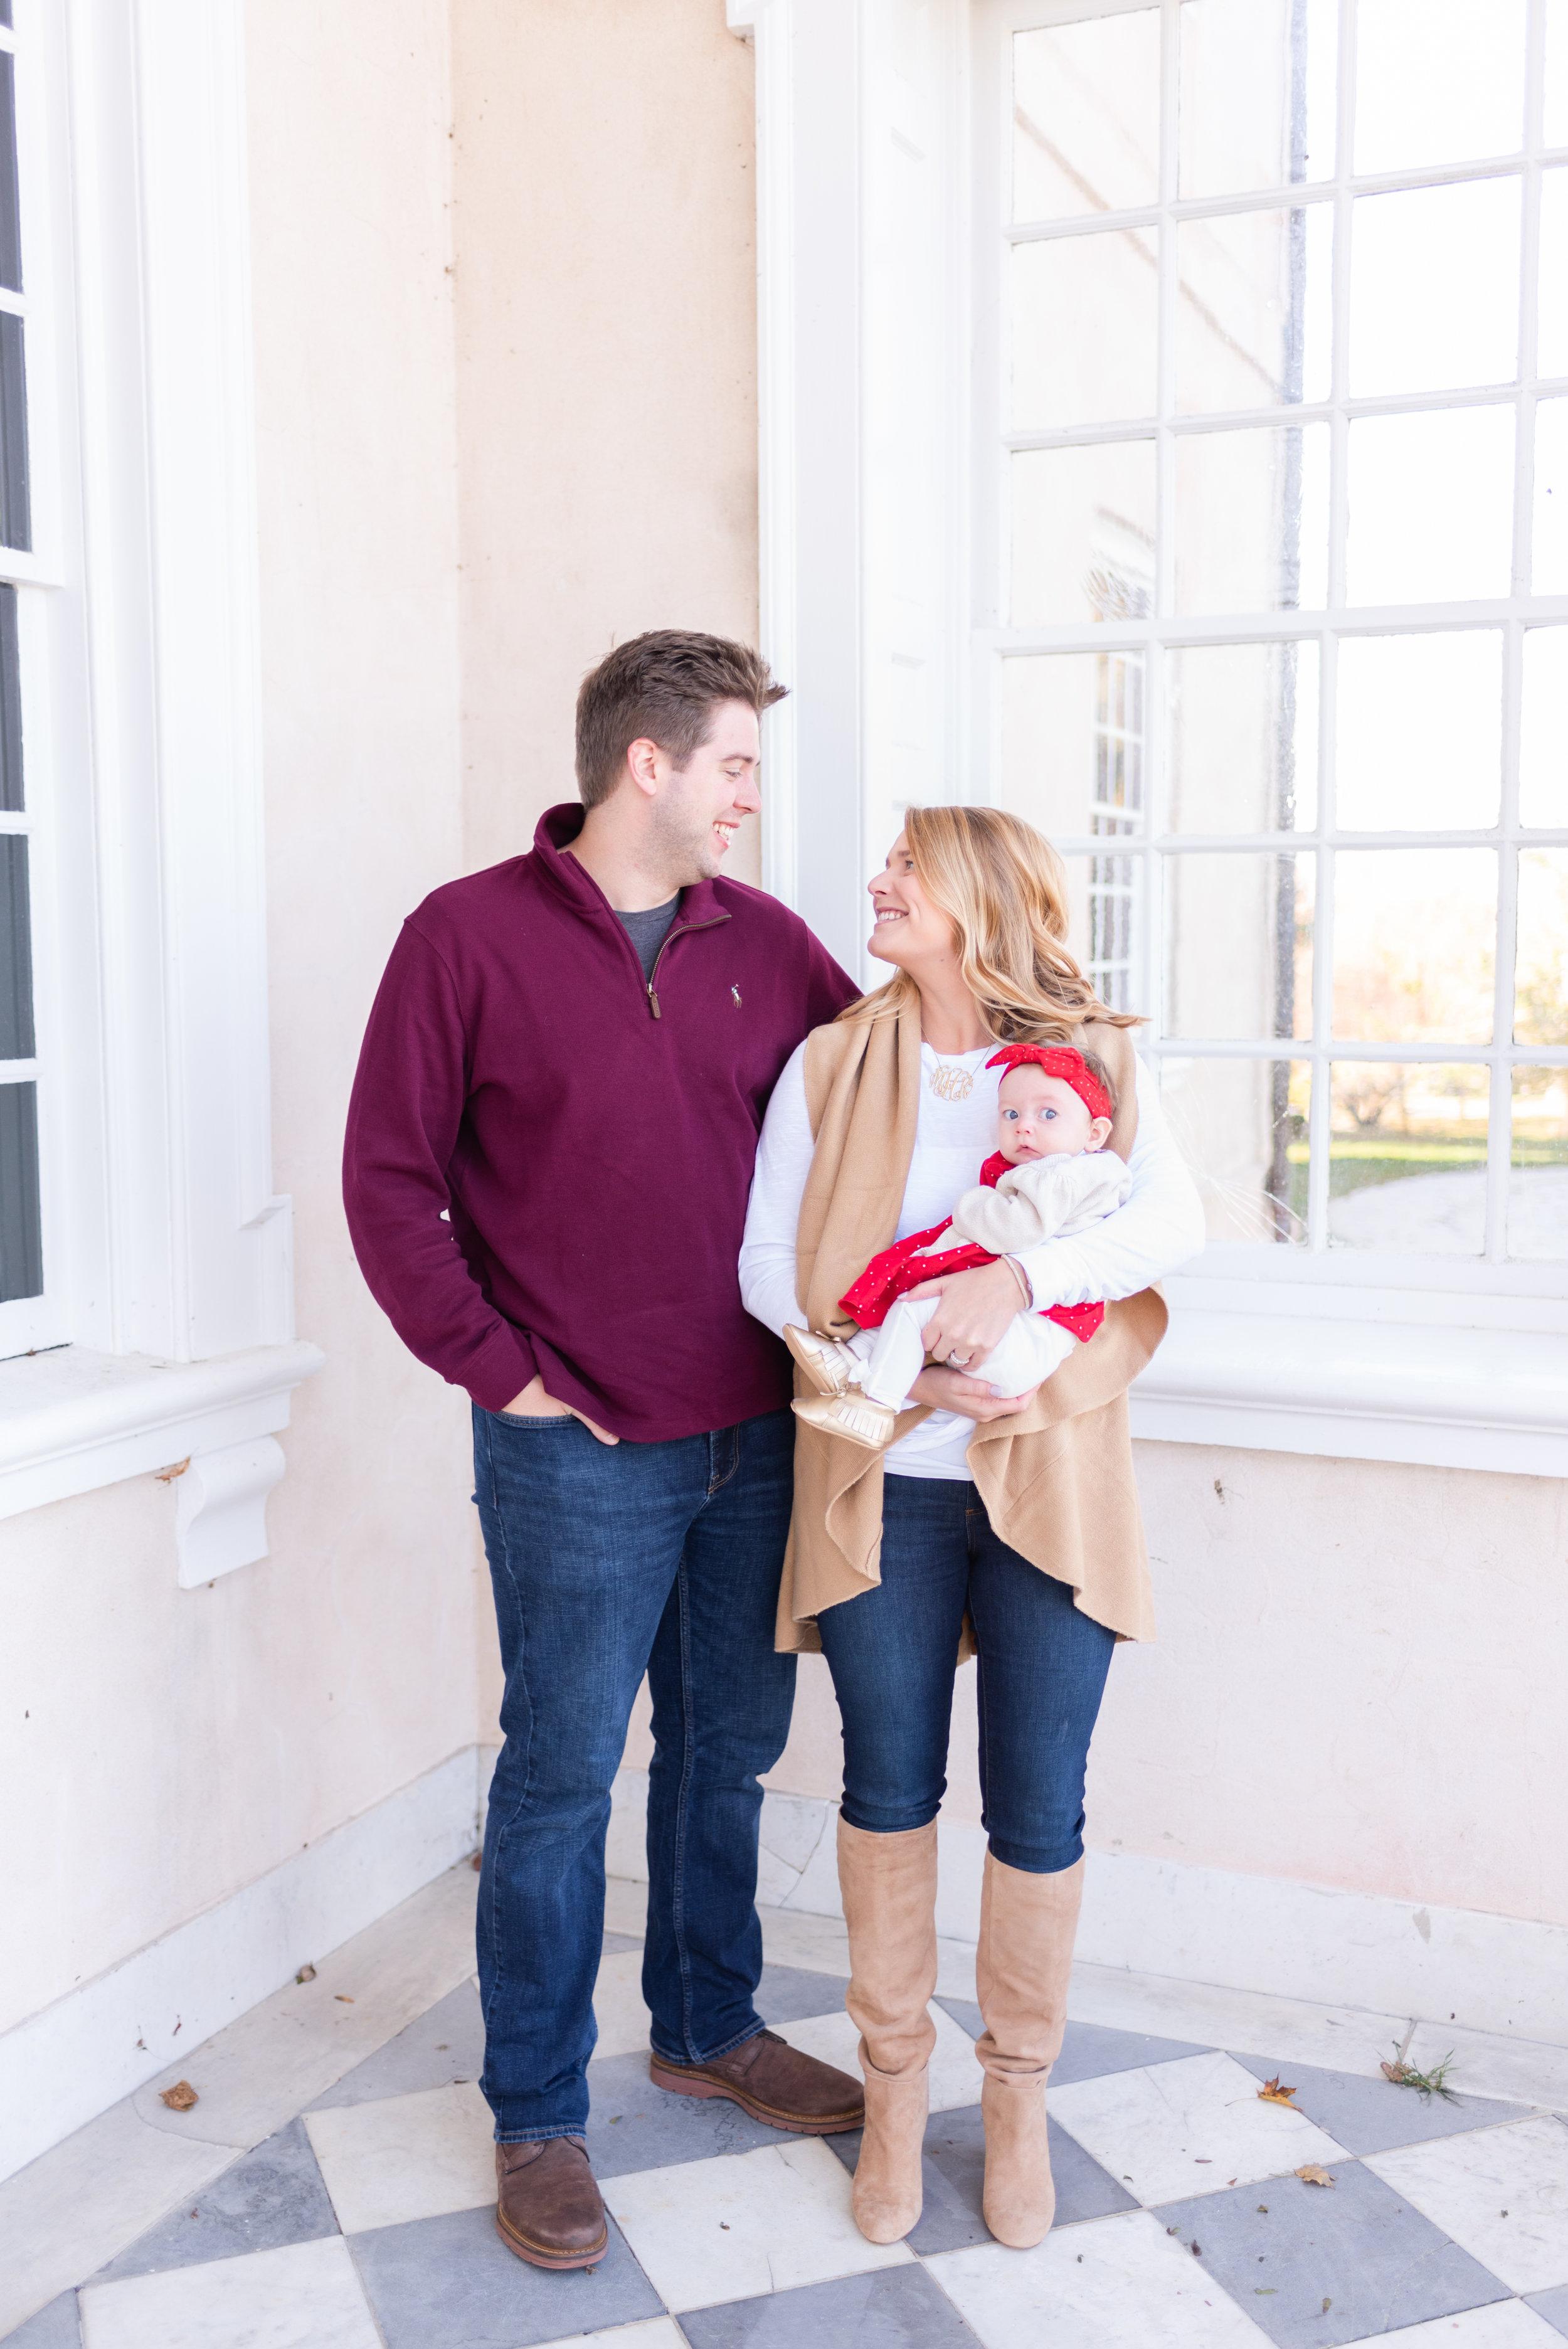 Henry Family - Hampton Mansion Family Photography (11 of 40).jpg